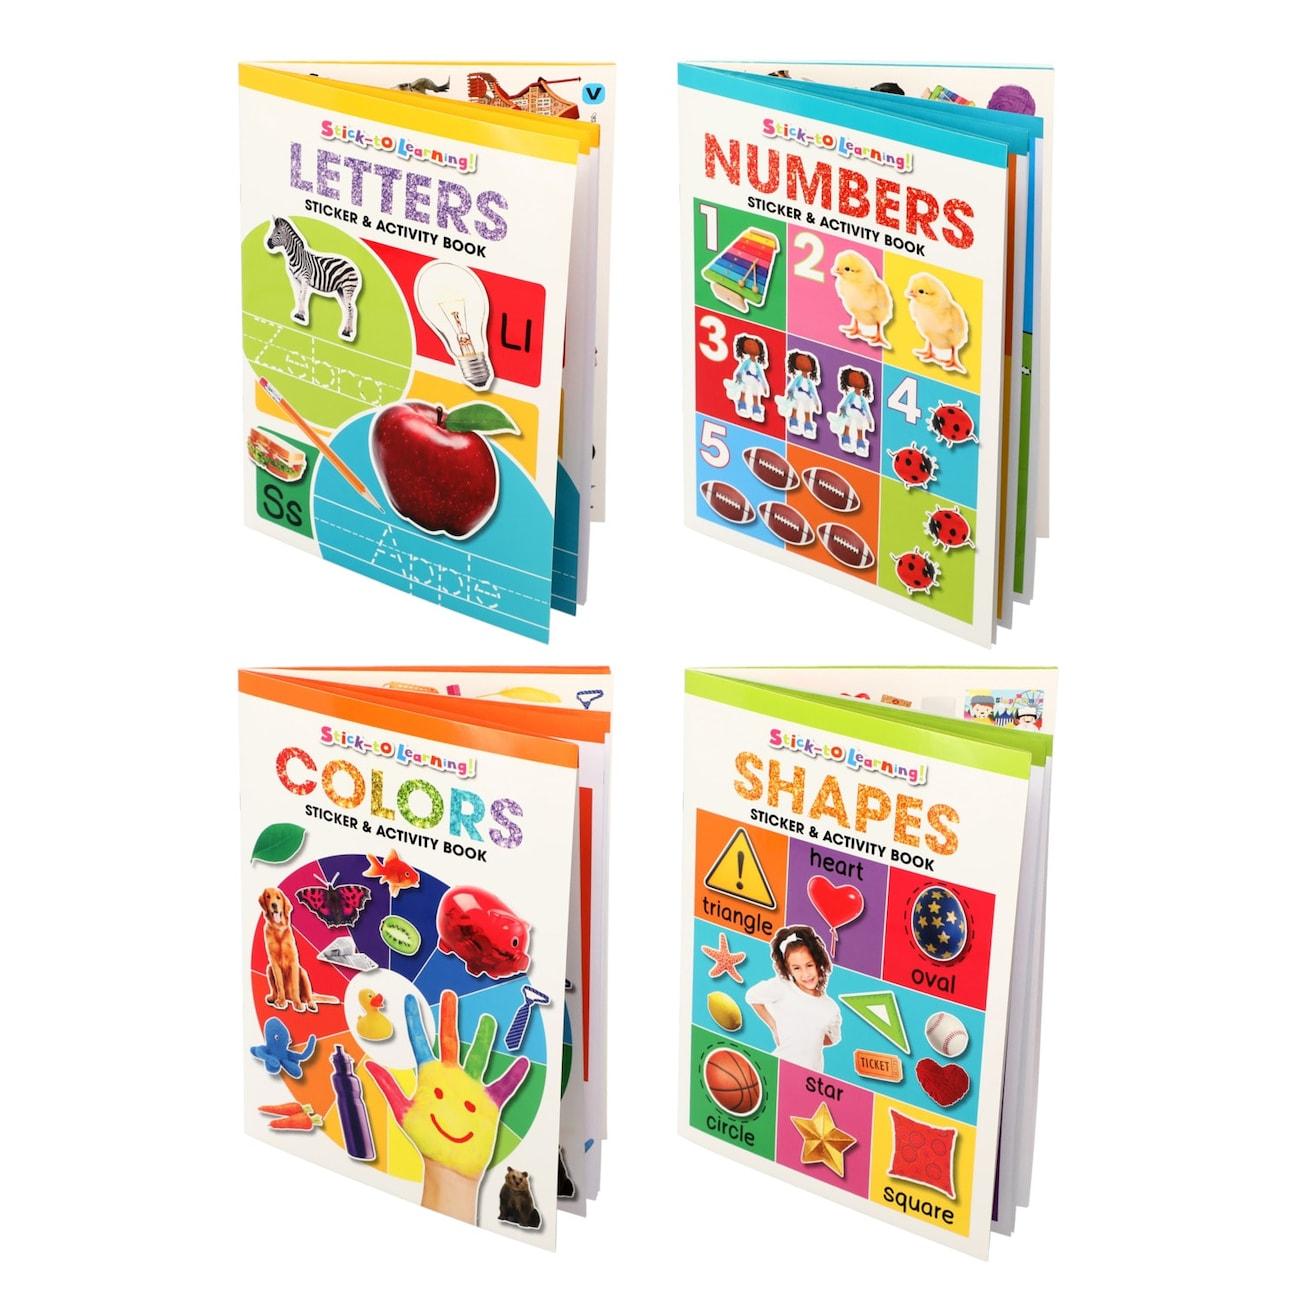 Kids Sticker Book Dollar Tree Inc Activity Books My Pretty Pink First Of Stickers